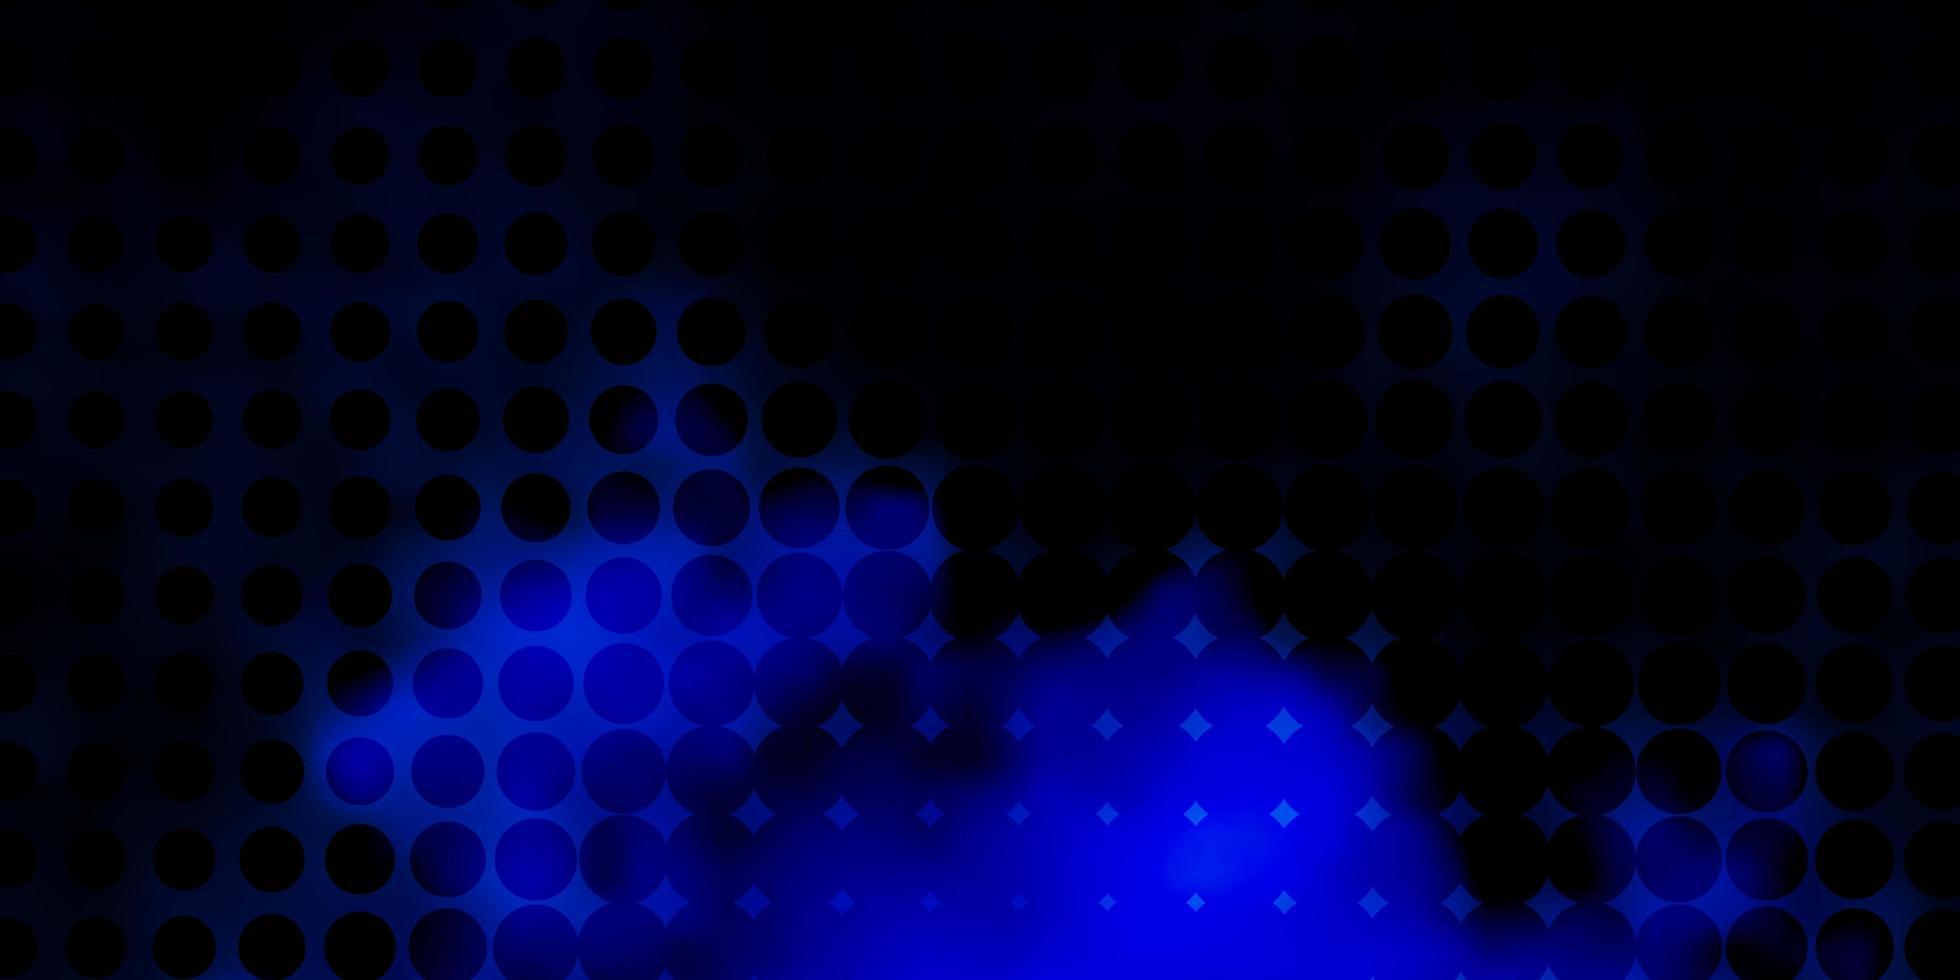 dunkelblaue Vektorschablone mit Kreisen. vektor